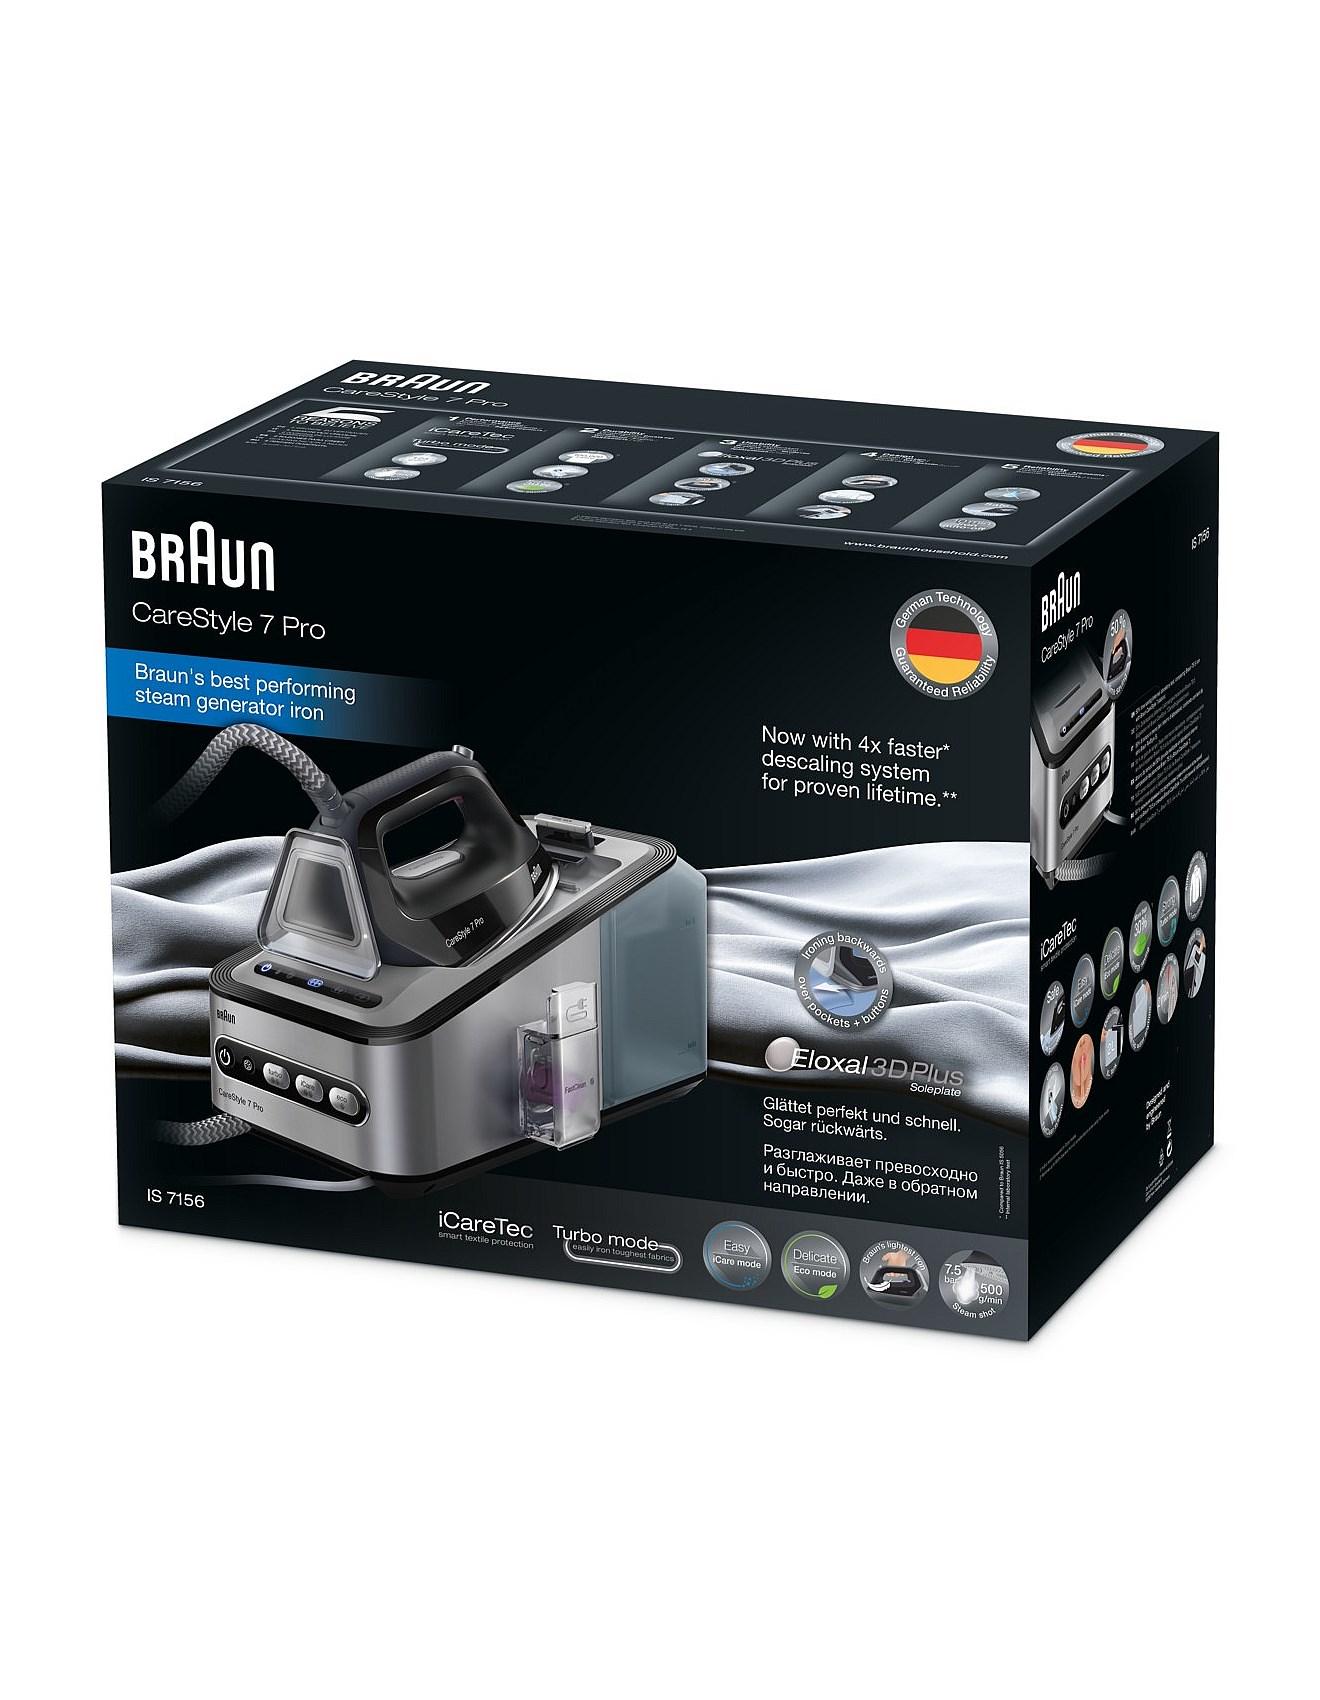 Small Appliances Buy Appliances Online David Jones Is7156bk